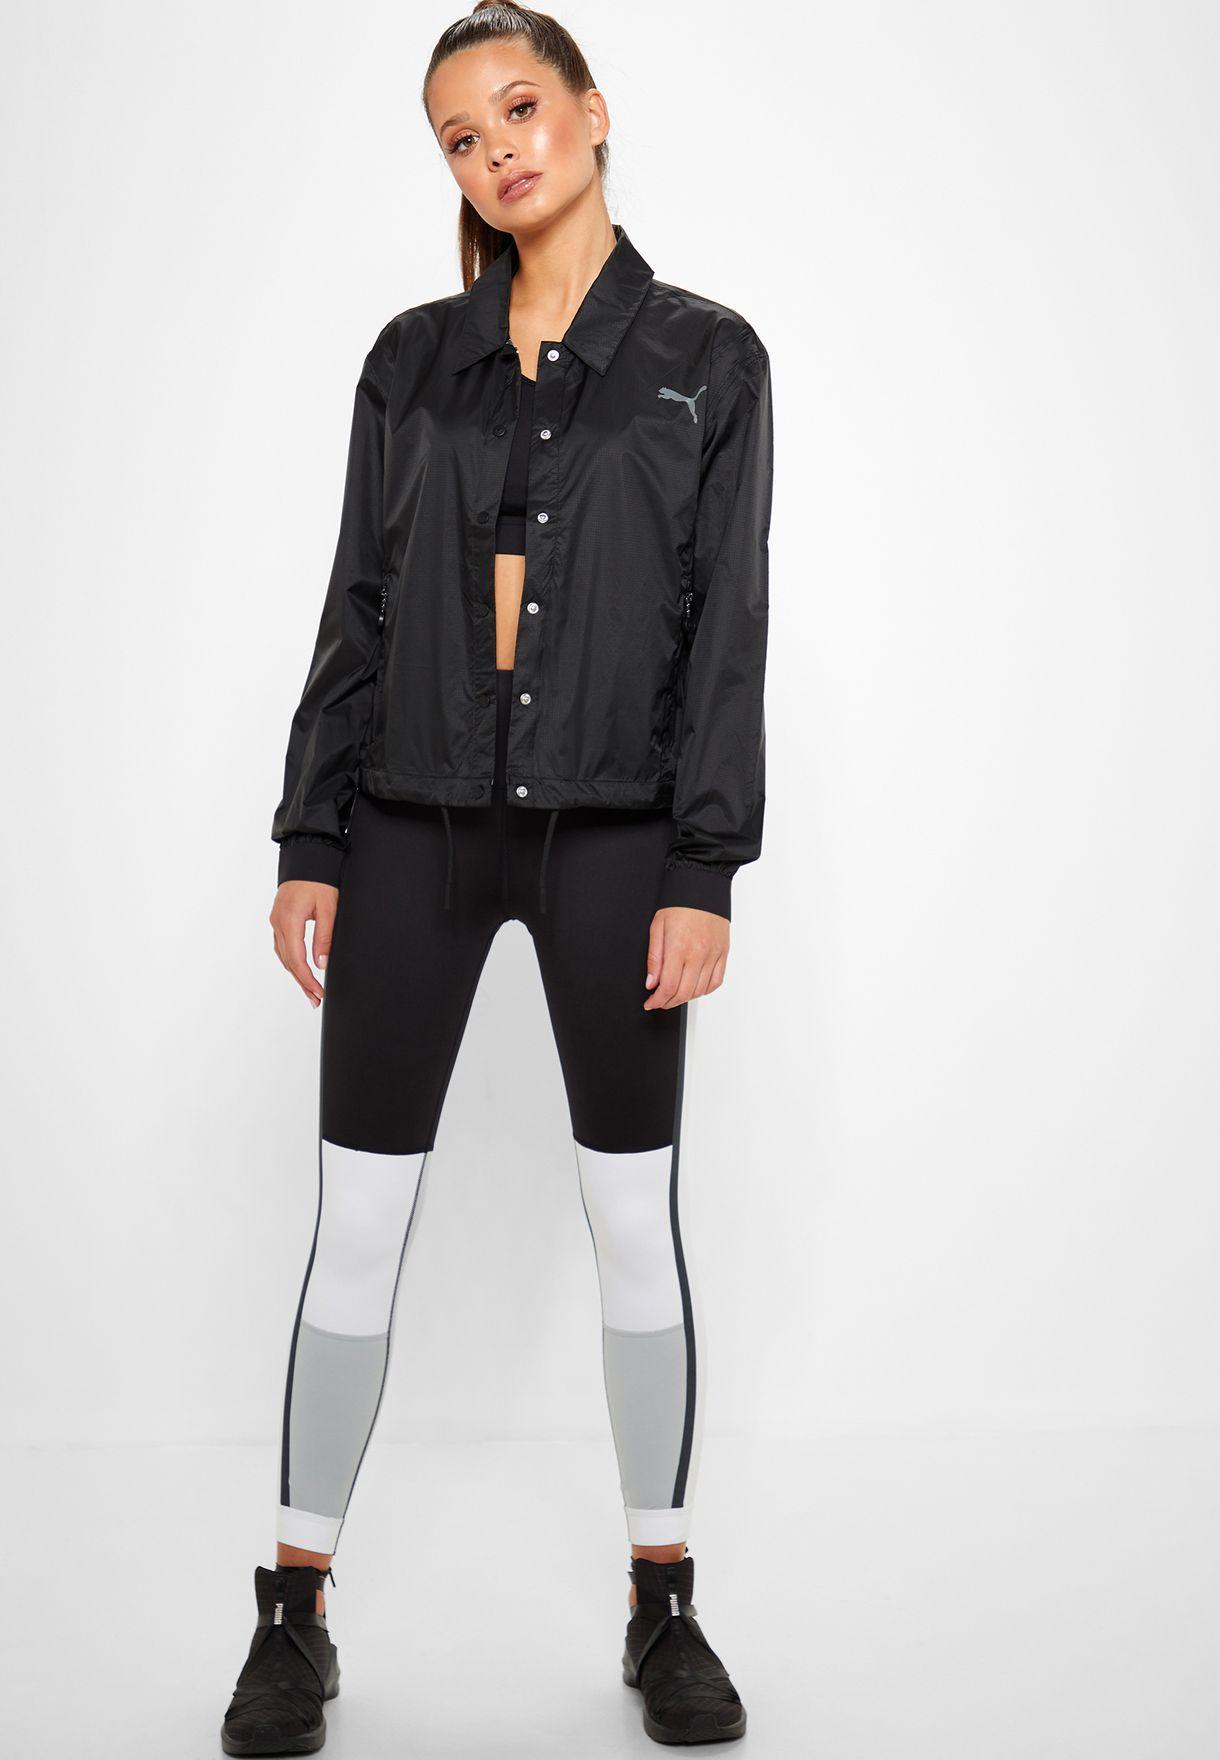 Selena Gomez Coaches Jacket